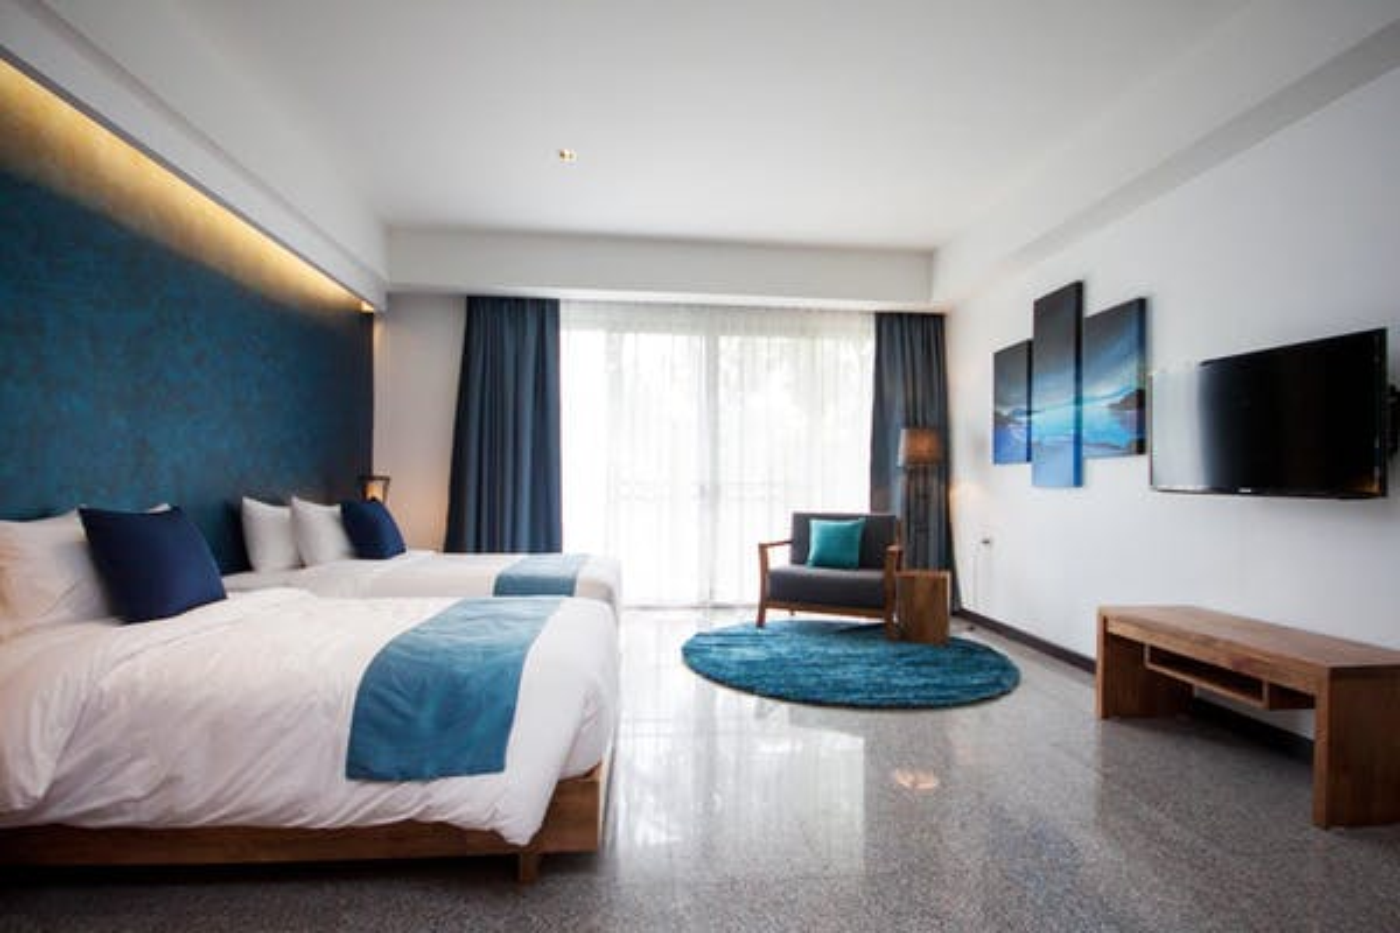 The Leela Resort & Spa Pattaya - Image 1